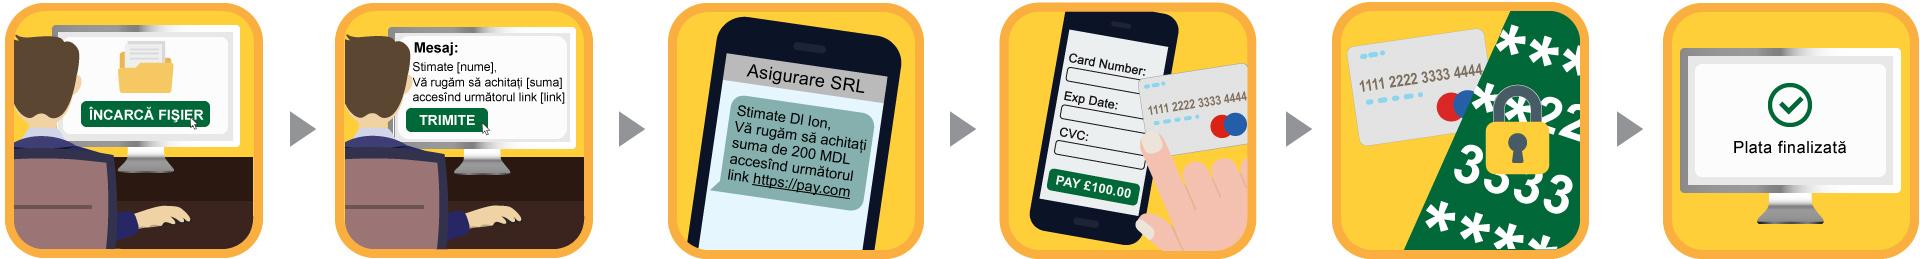 Outbound-Flows-Paylei-RO-SMS